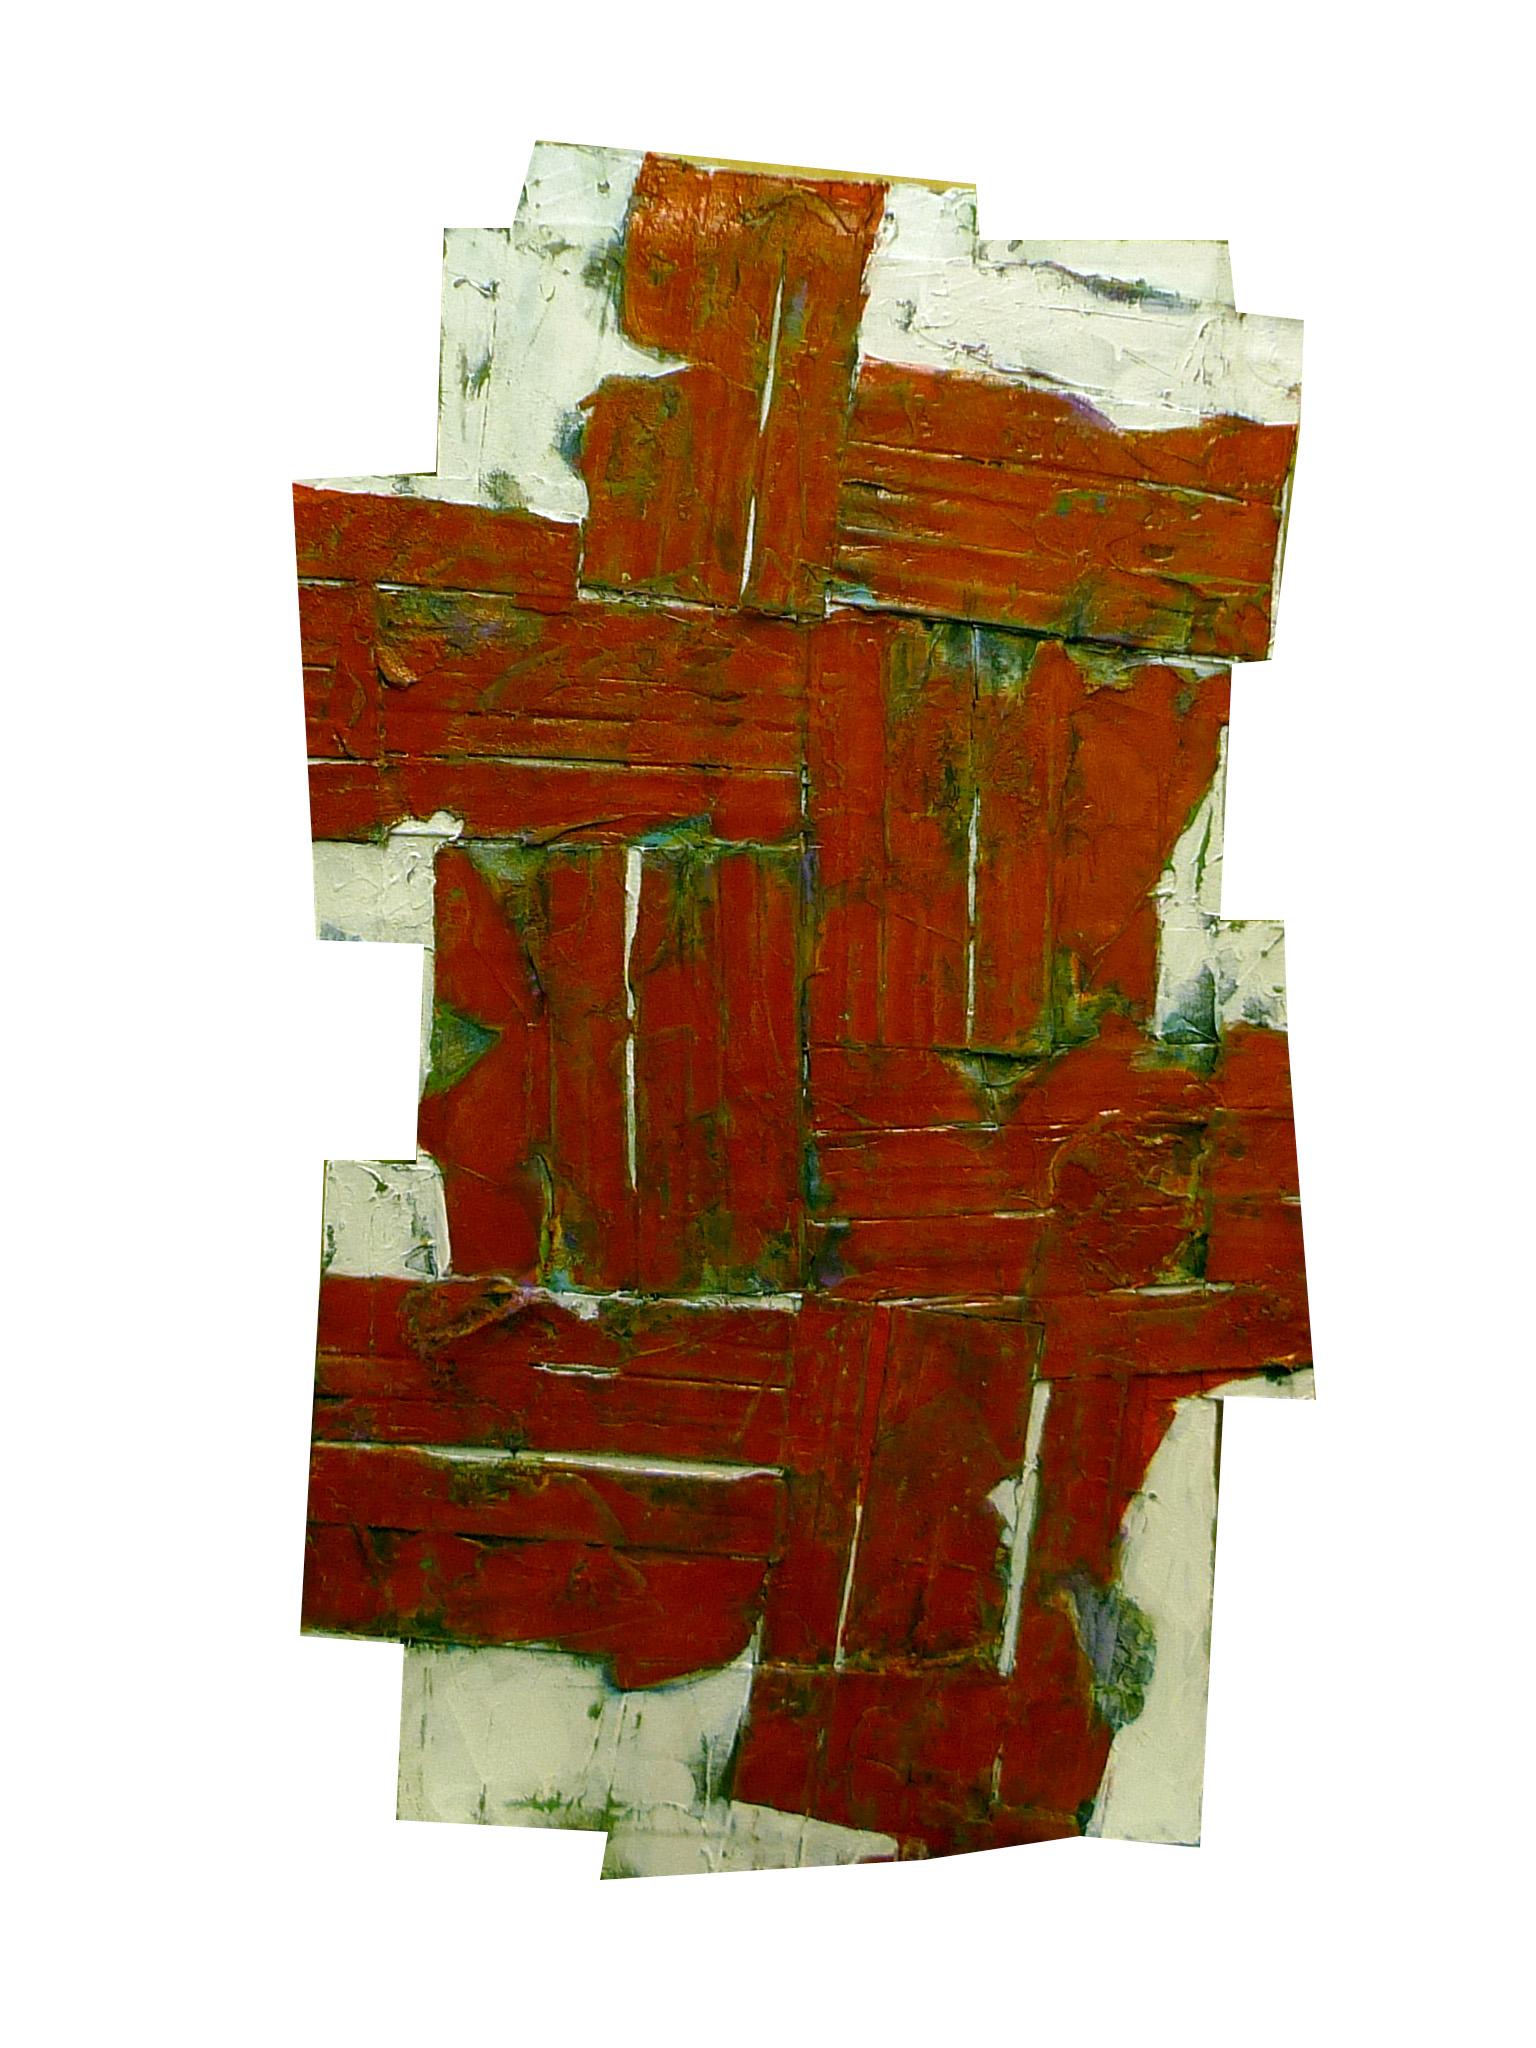 02.No.196.,2012,canvas,52x30x3,Kuroo.jpg